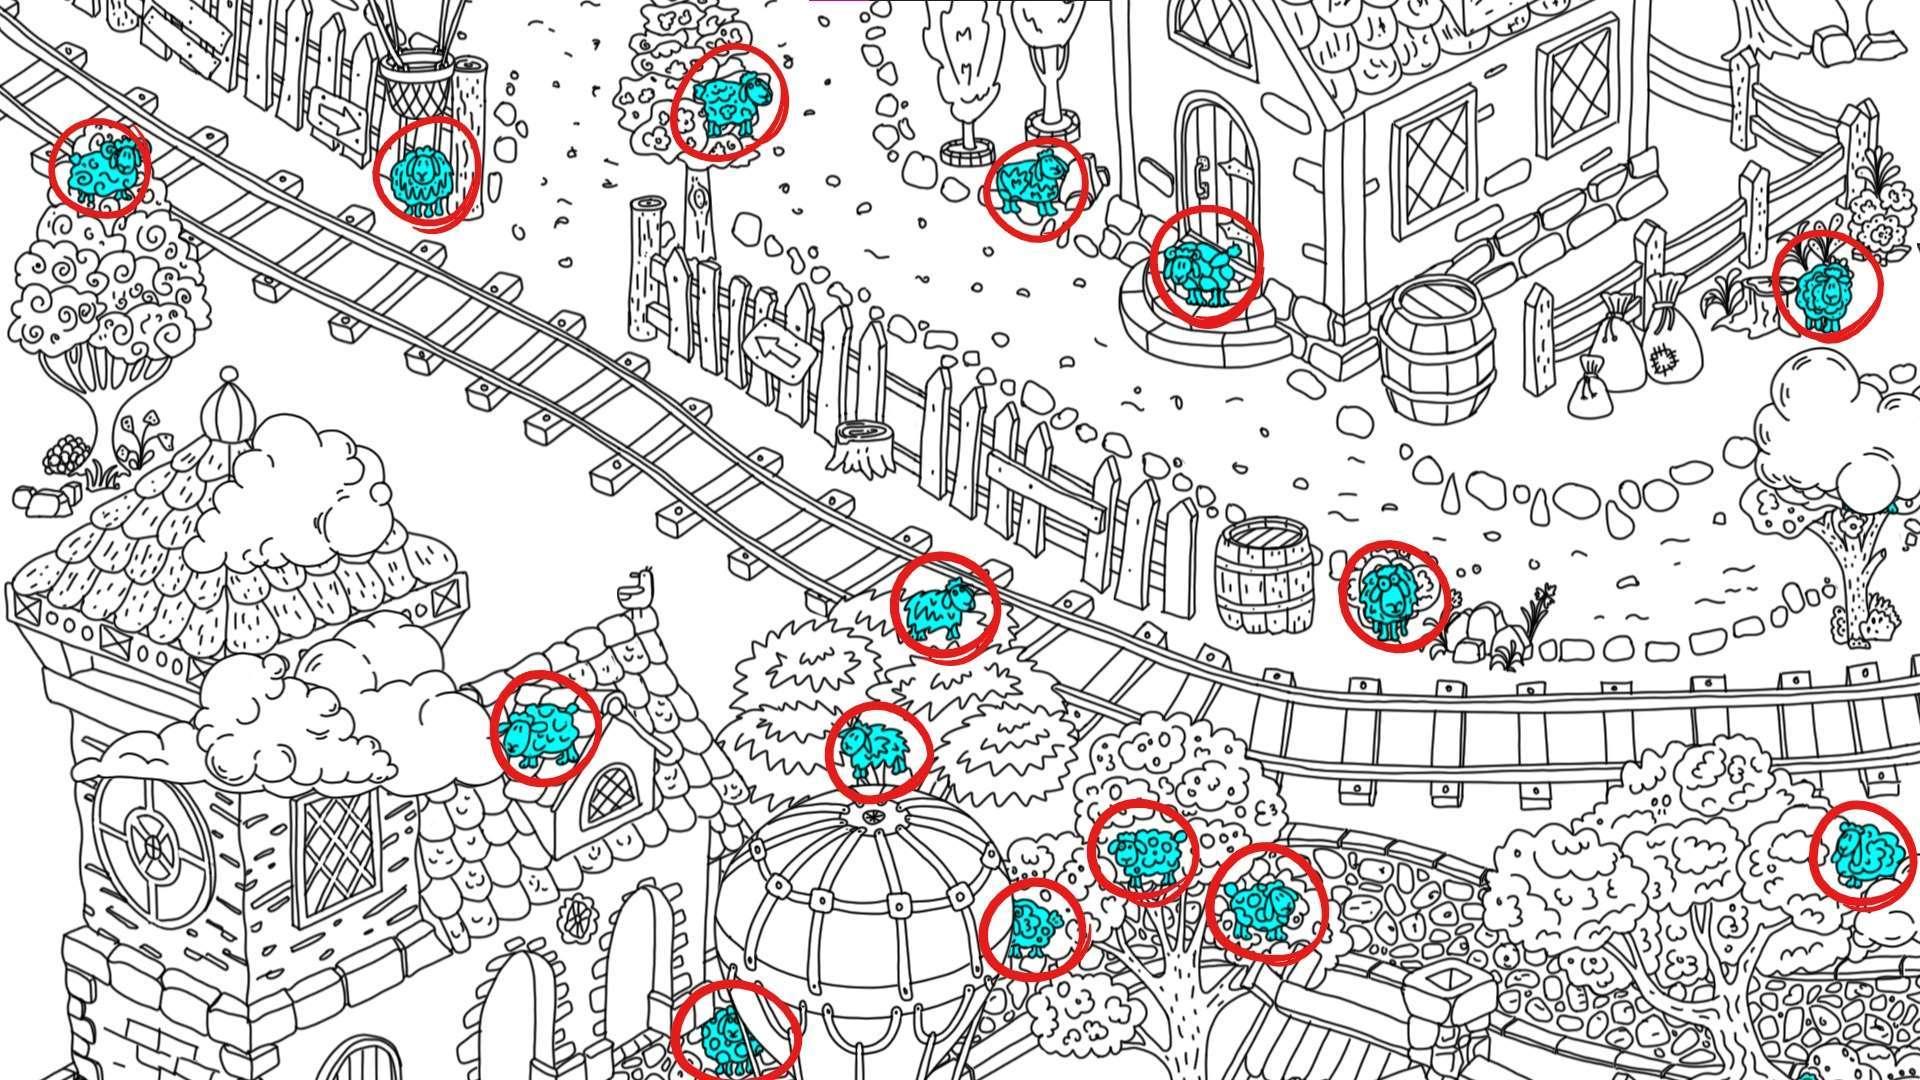 100 hidden rams - All Hidden Ram Location - Map Guide - all rams - EB5E408